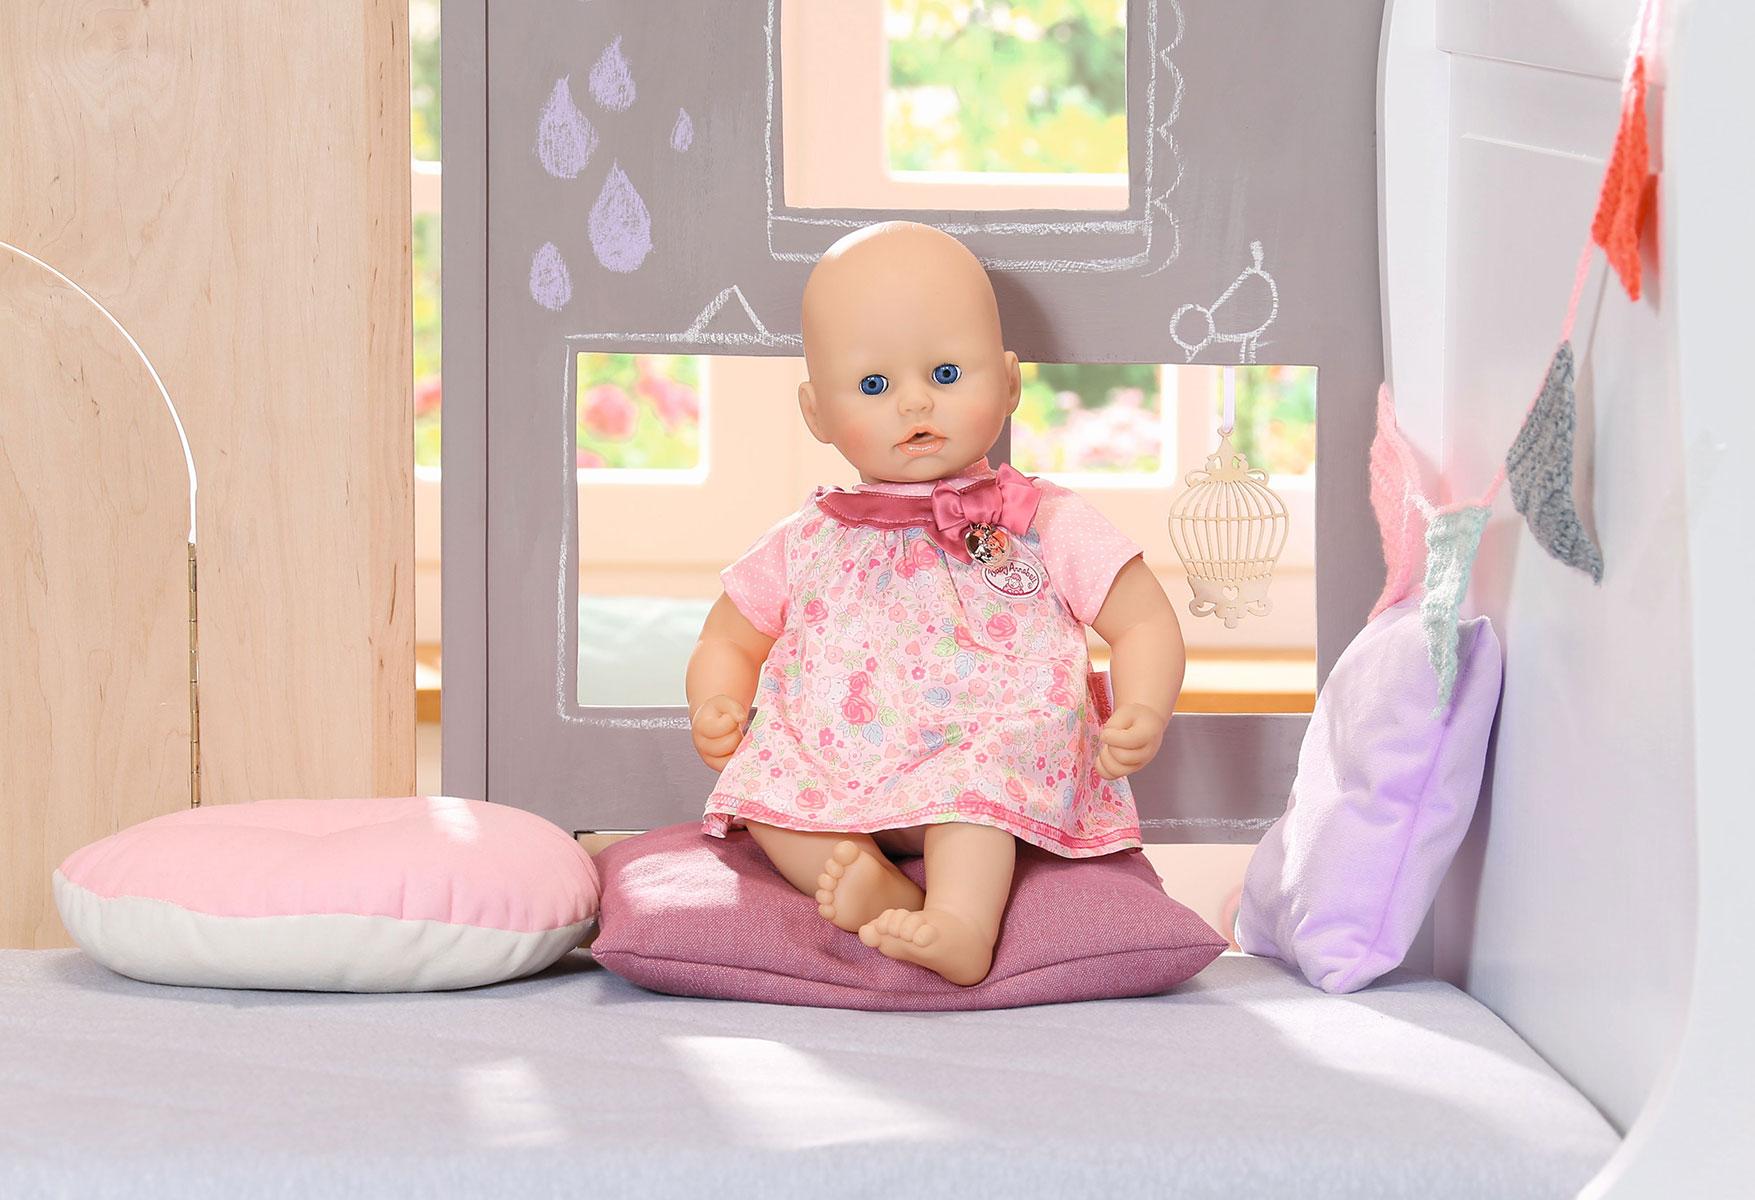 Baby annabell Kleding Baby Annabell jurk roze - DSC Webshop